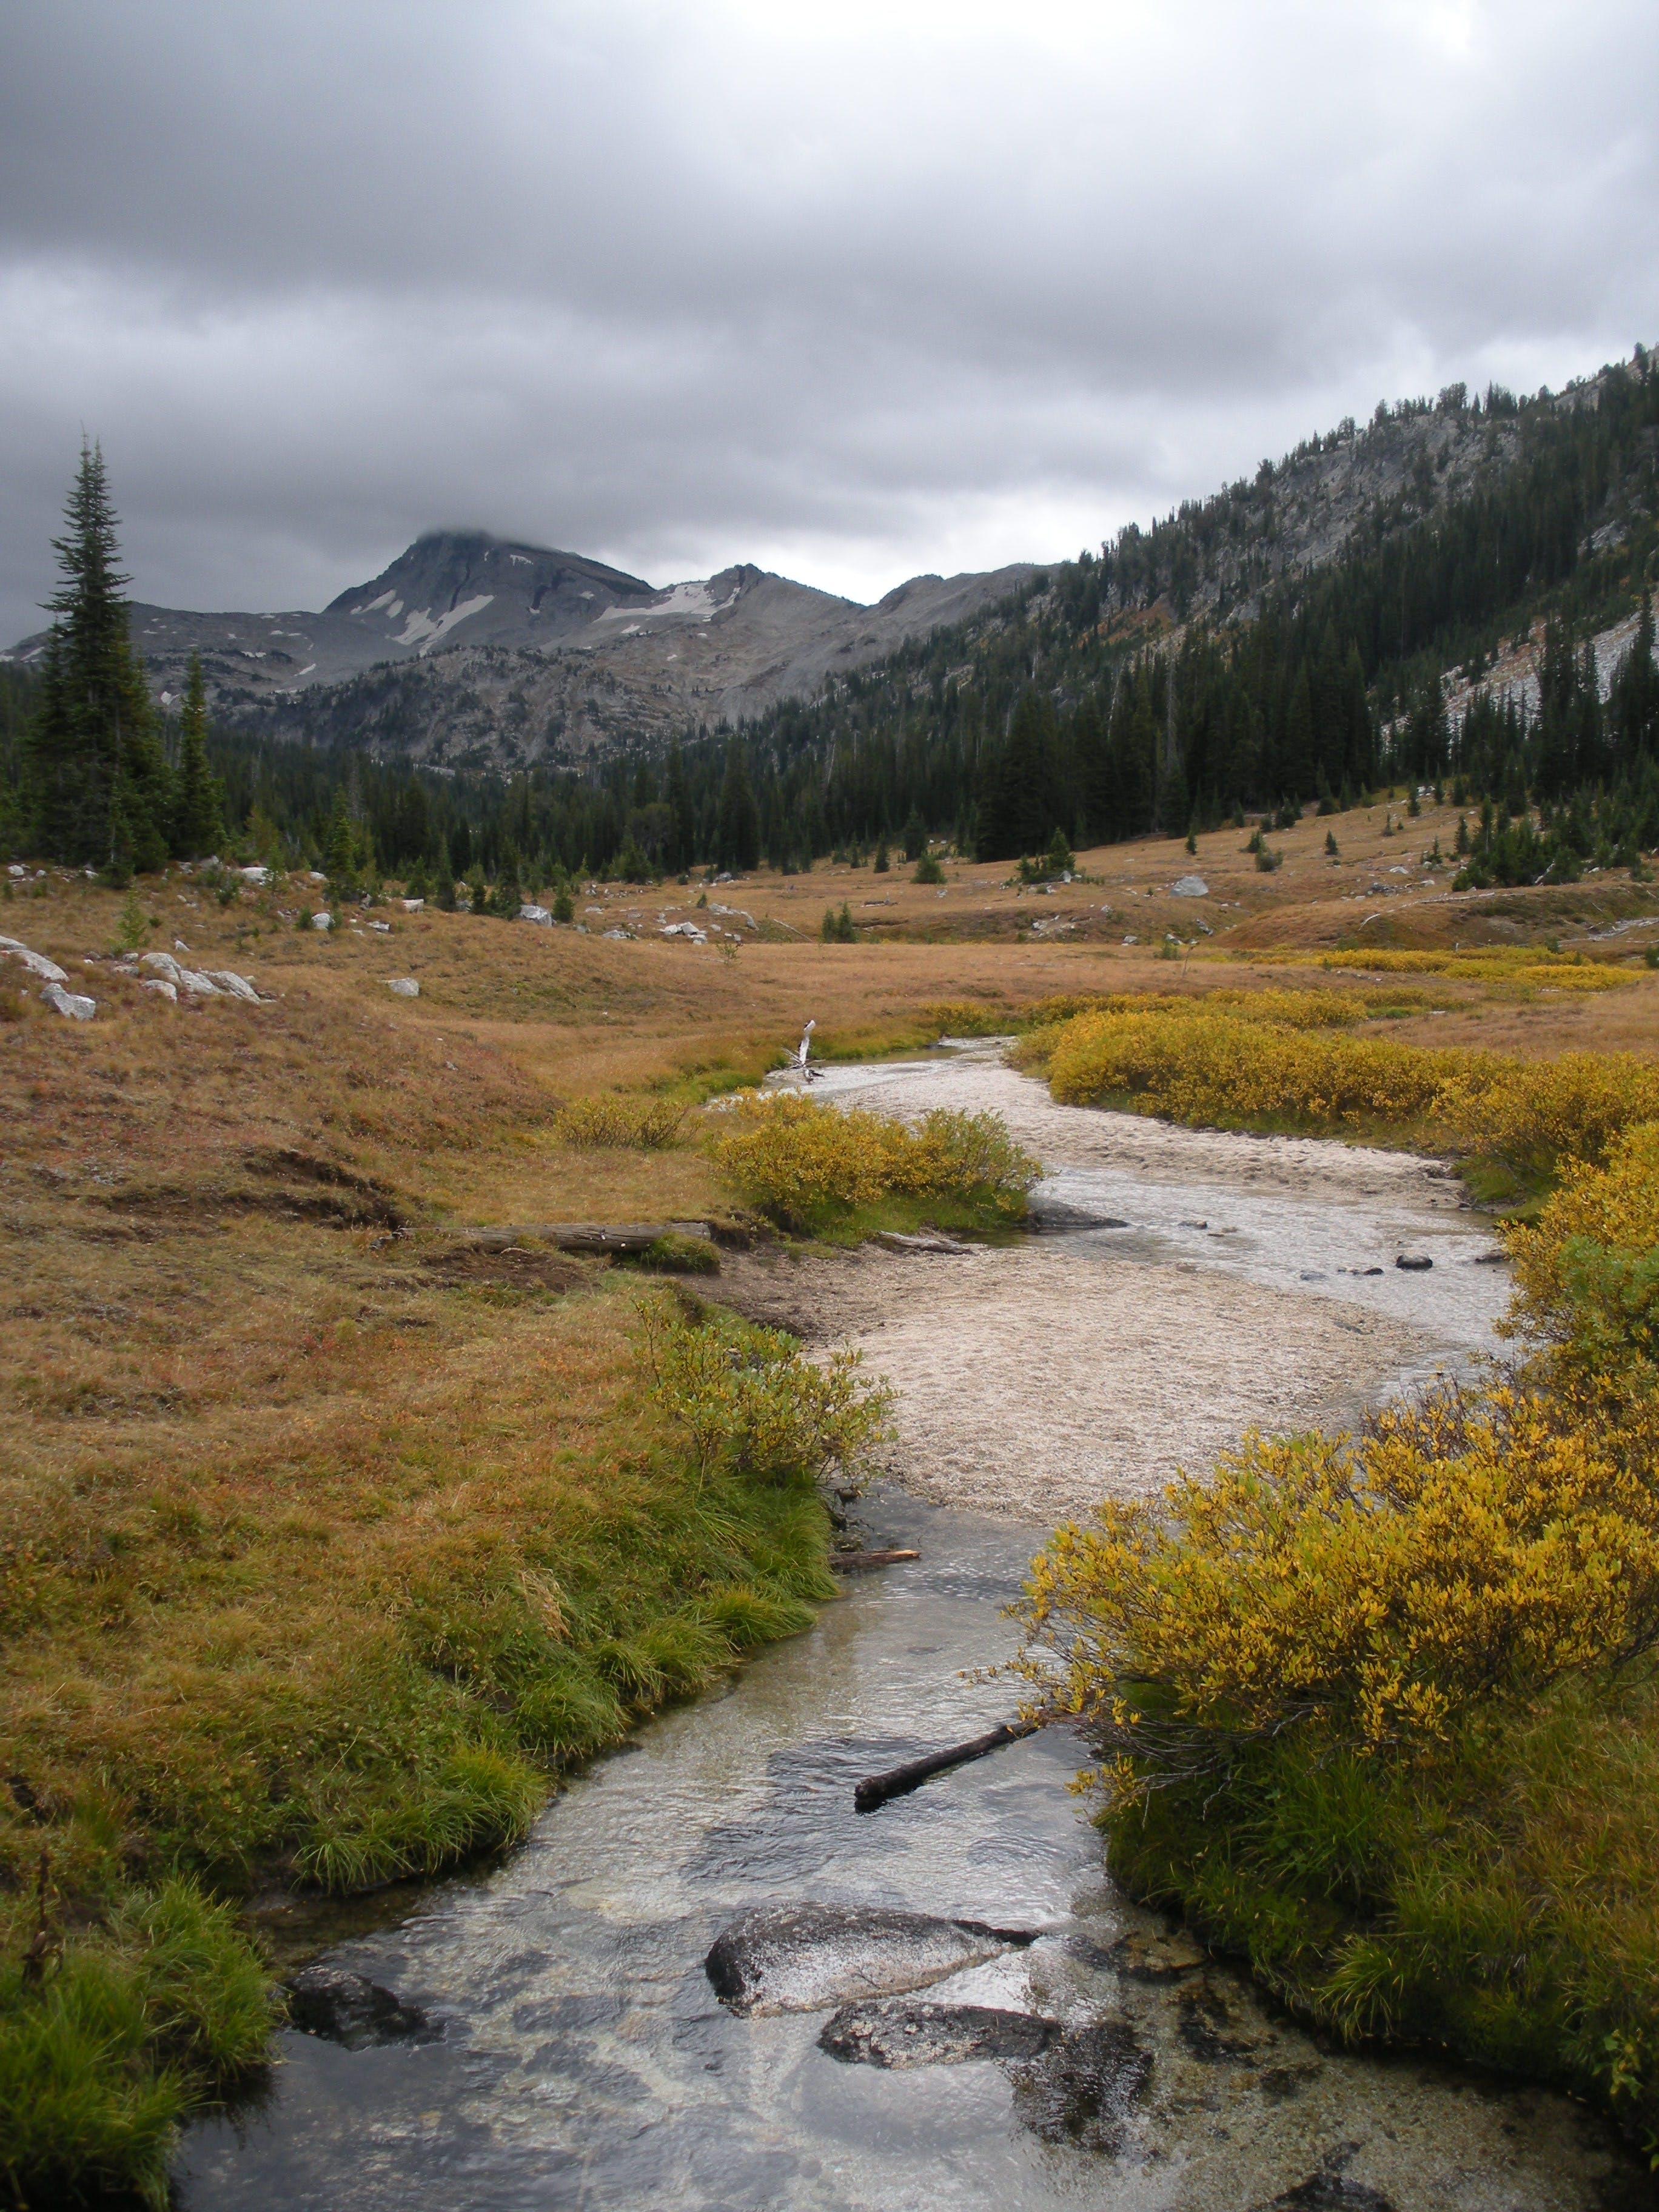 Free stock photo of Joe Leineweber, Wallowa Mountains, Whitman National Forest